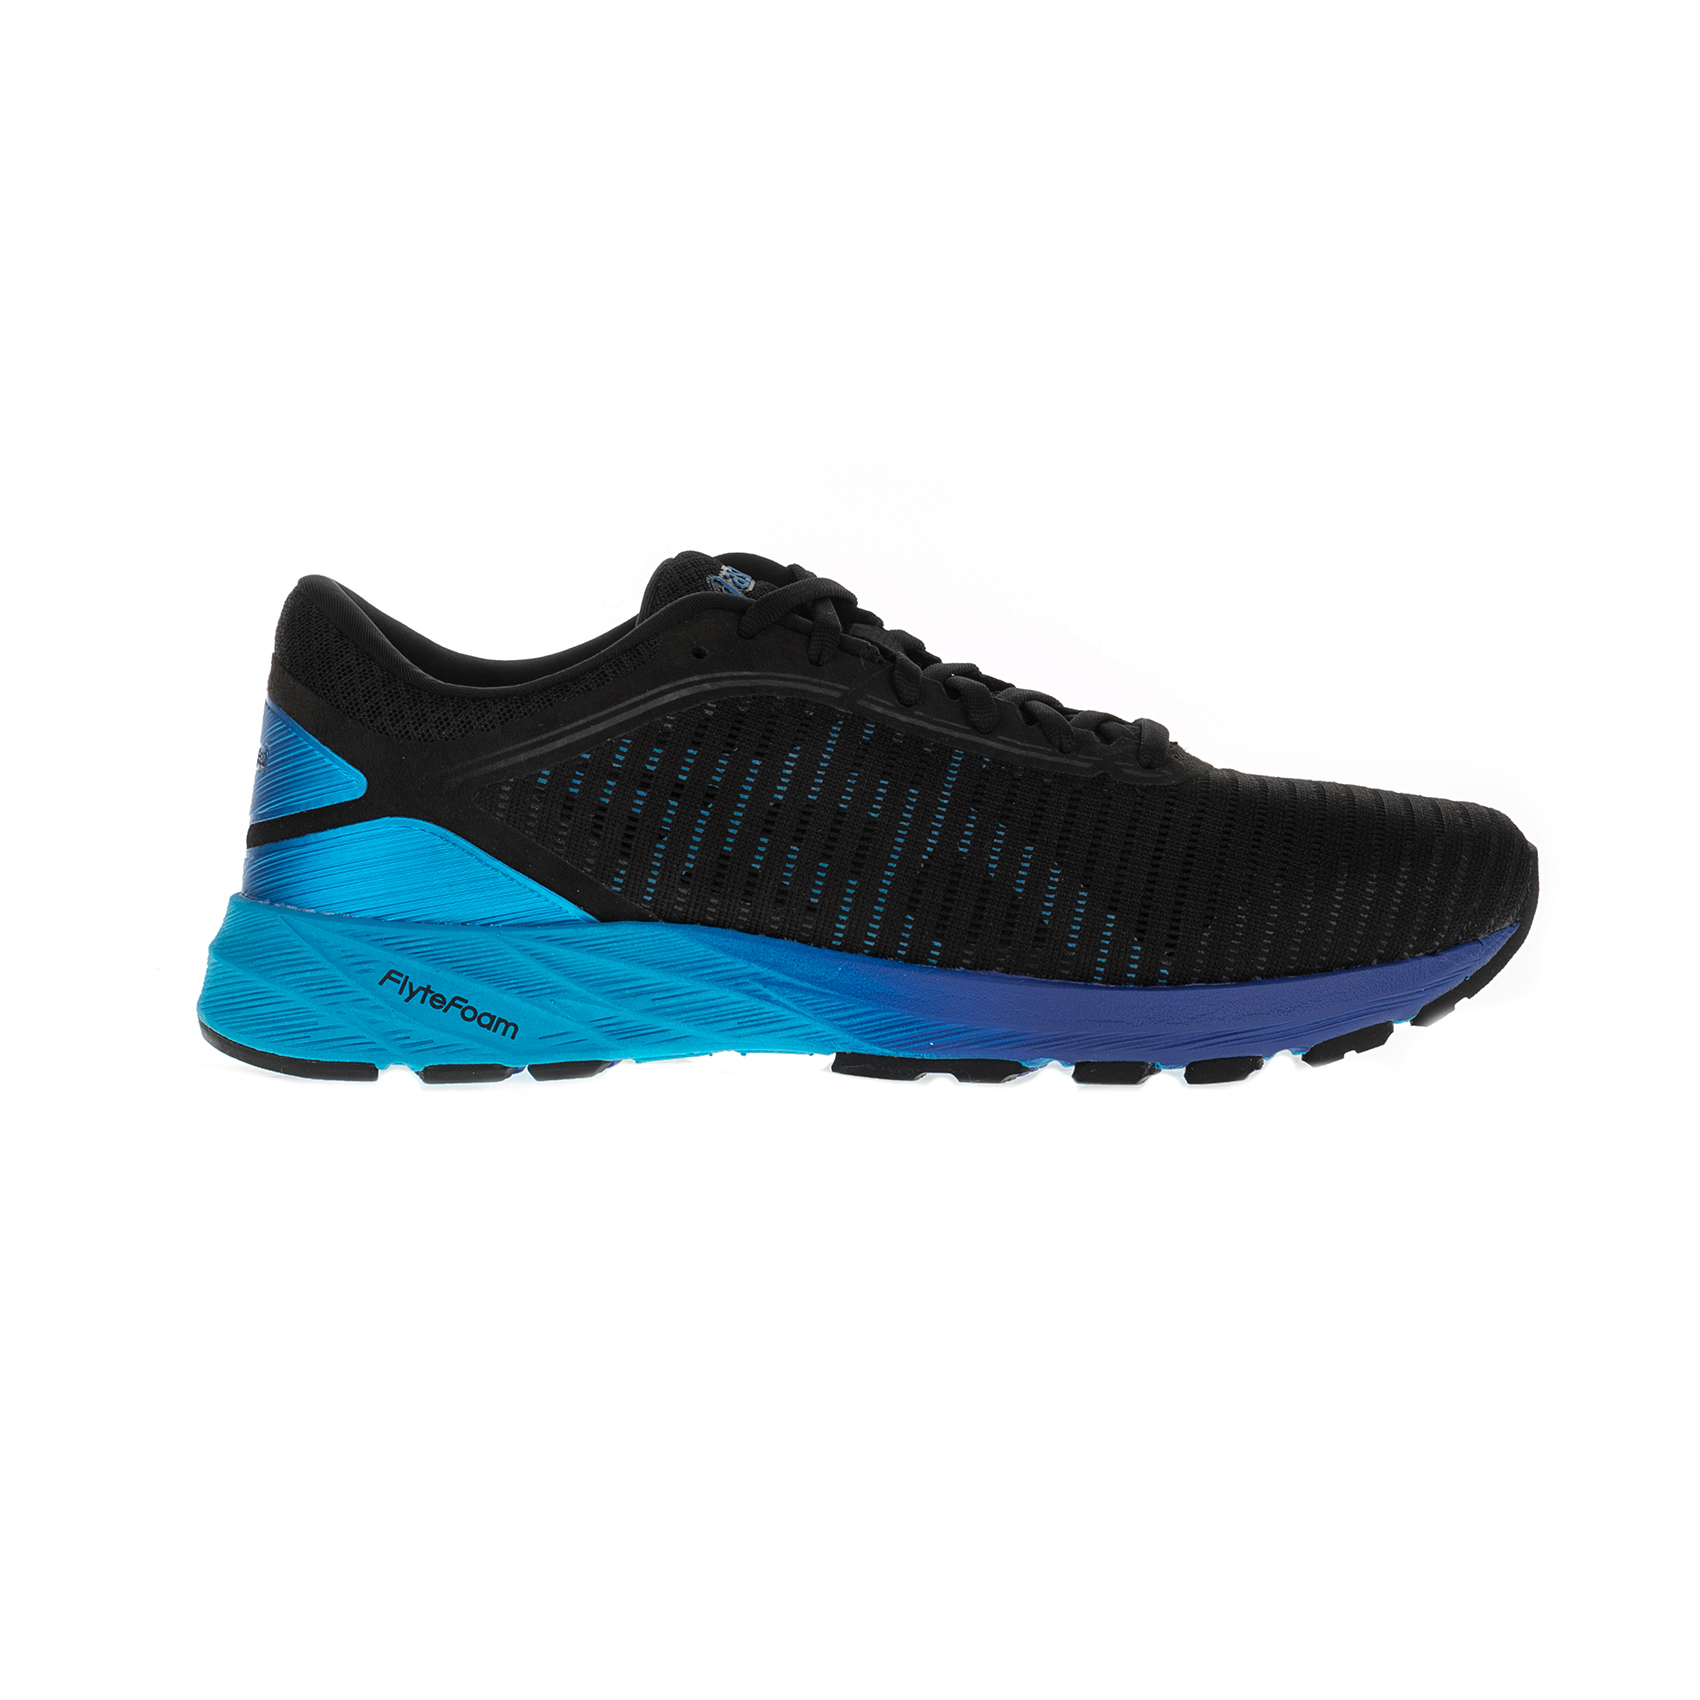 ASICS – Ανδρικά παπούτσια ASICS DynaFlyte 2 μάυρα-μπλε